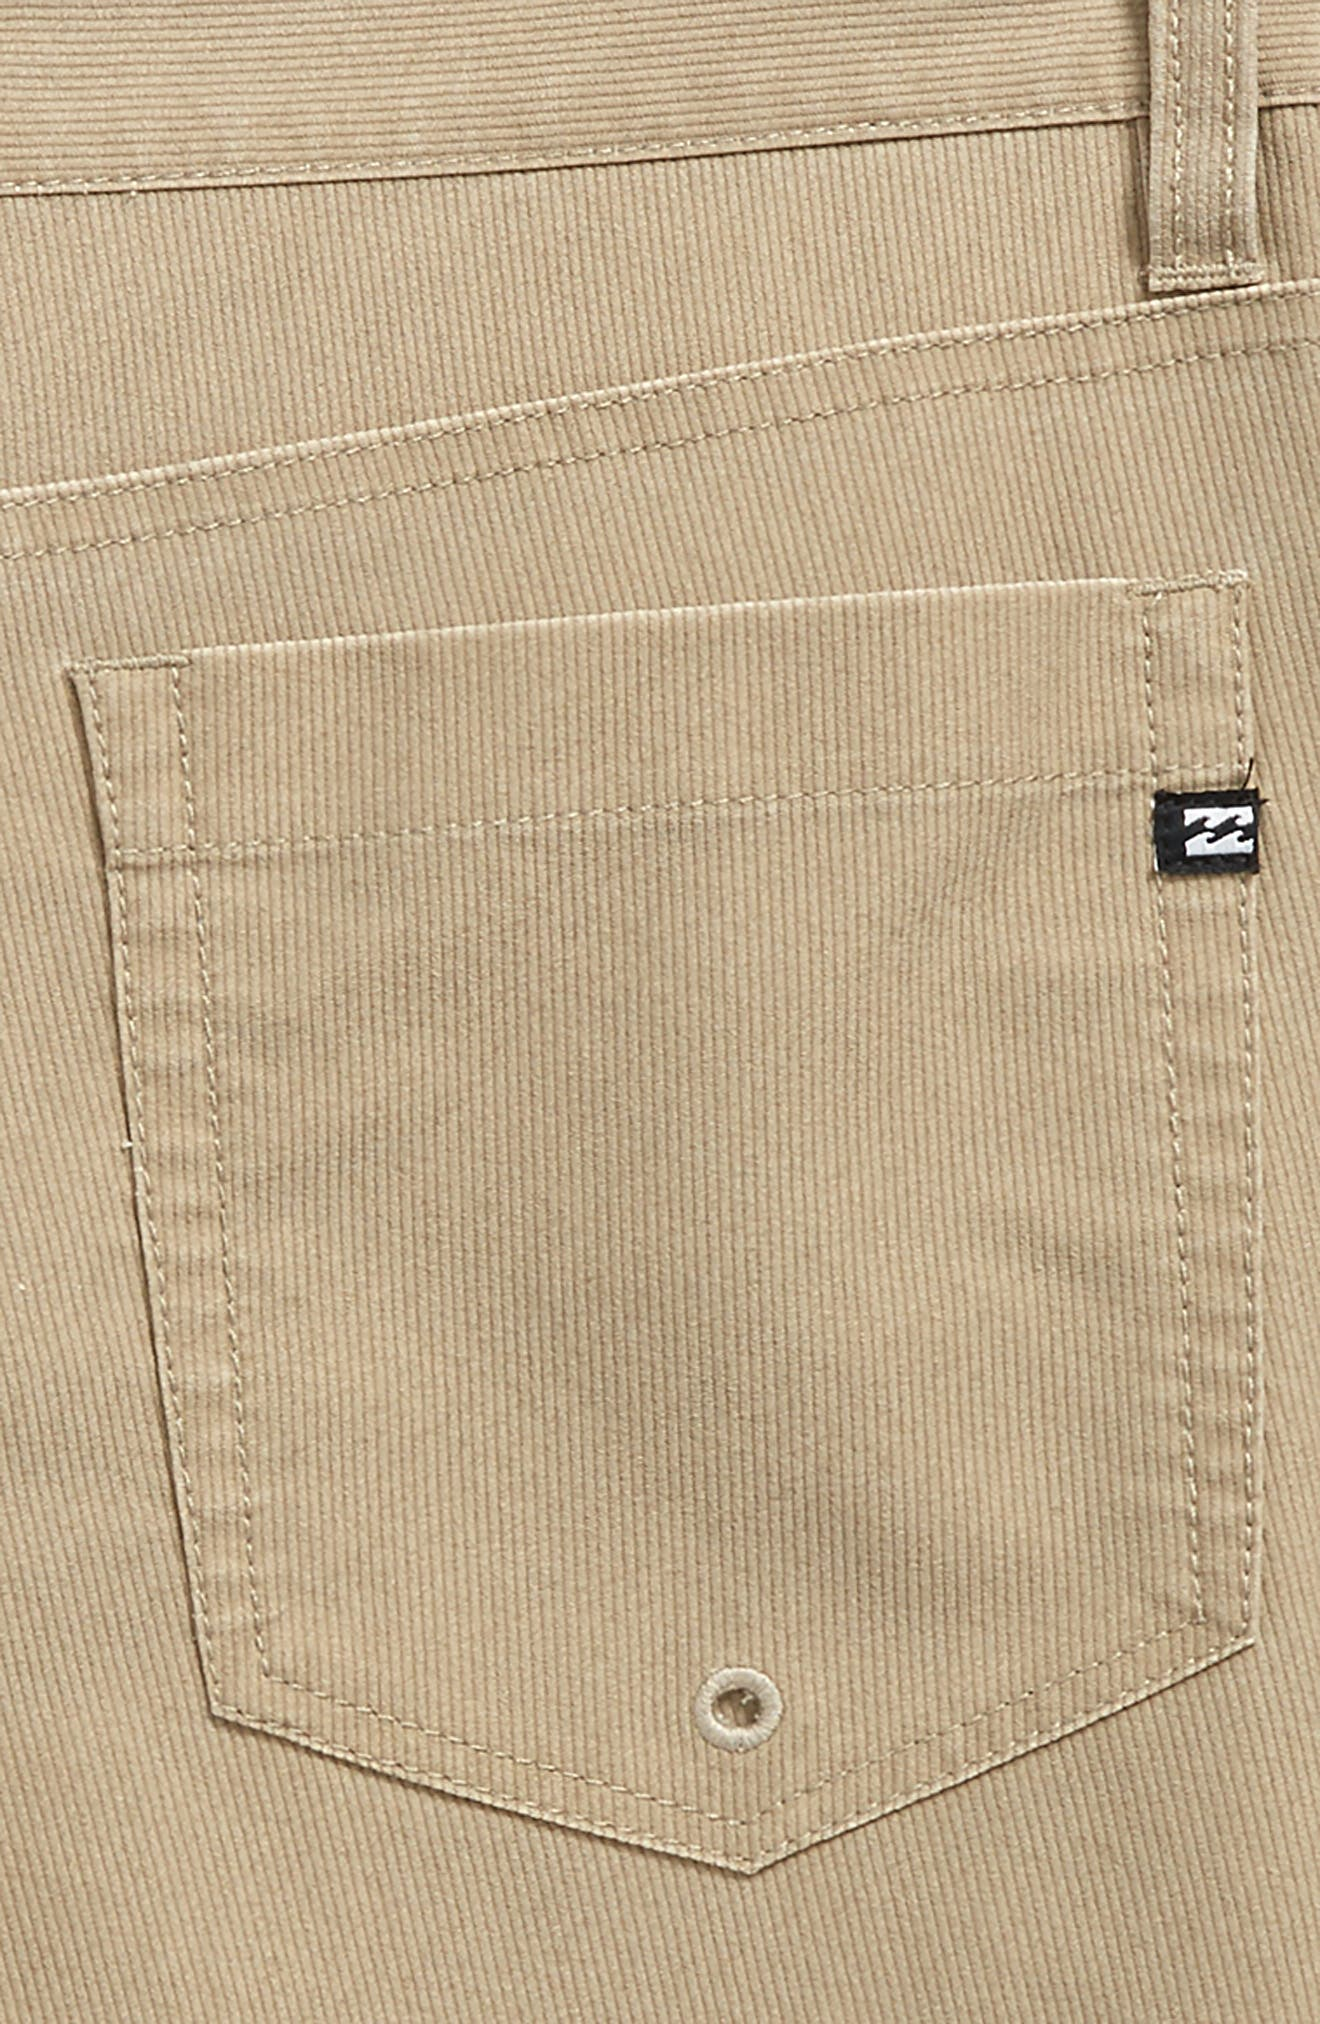 BILLABONG,                             Outsider X Surf Corduroy Hybrid Shorts,                             Alternate thumbnail 3, color,                             259